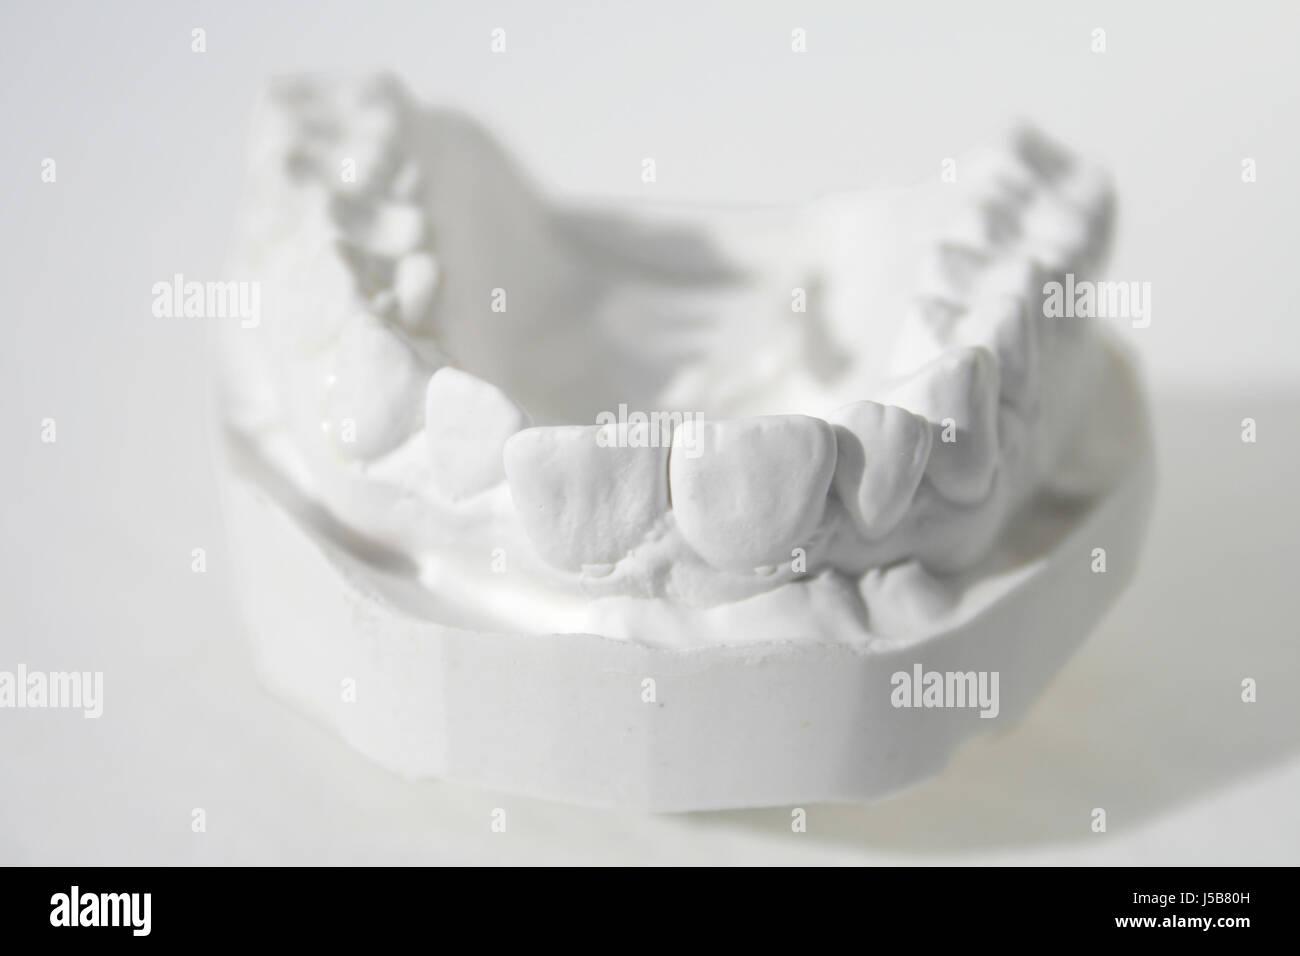 plaster model maxillary anterior view - Stock Image